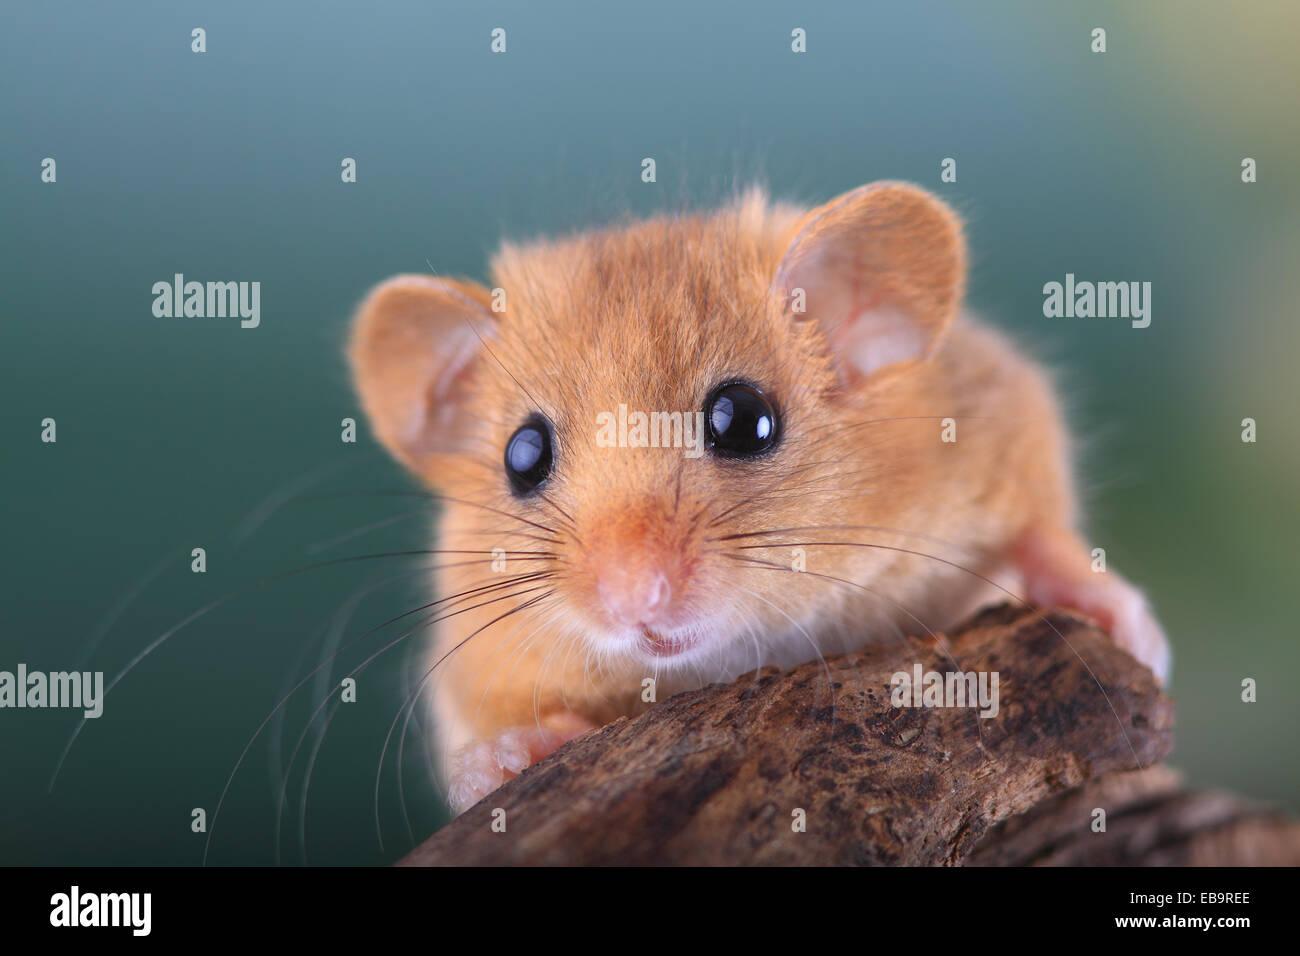 Hazel Dormouse, Haselmaus (Muscardinus Avellanarius), Porträt, Oberbiel, Solms, Hessen, Deutschland Stockfoto